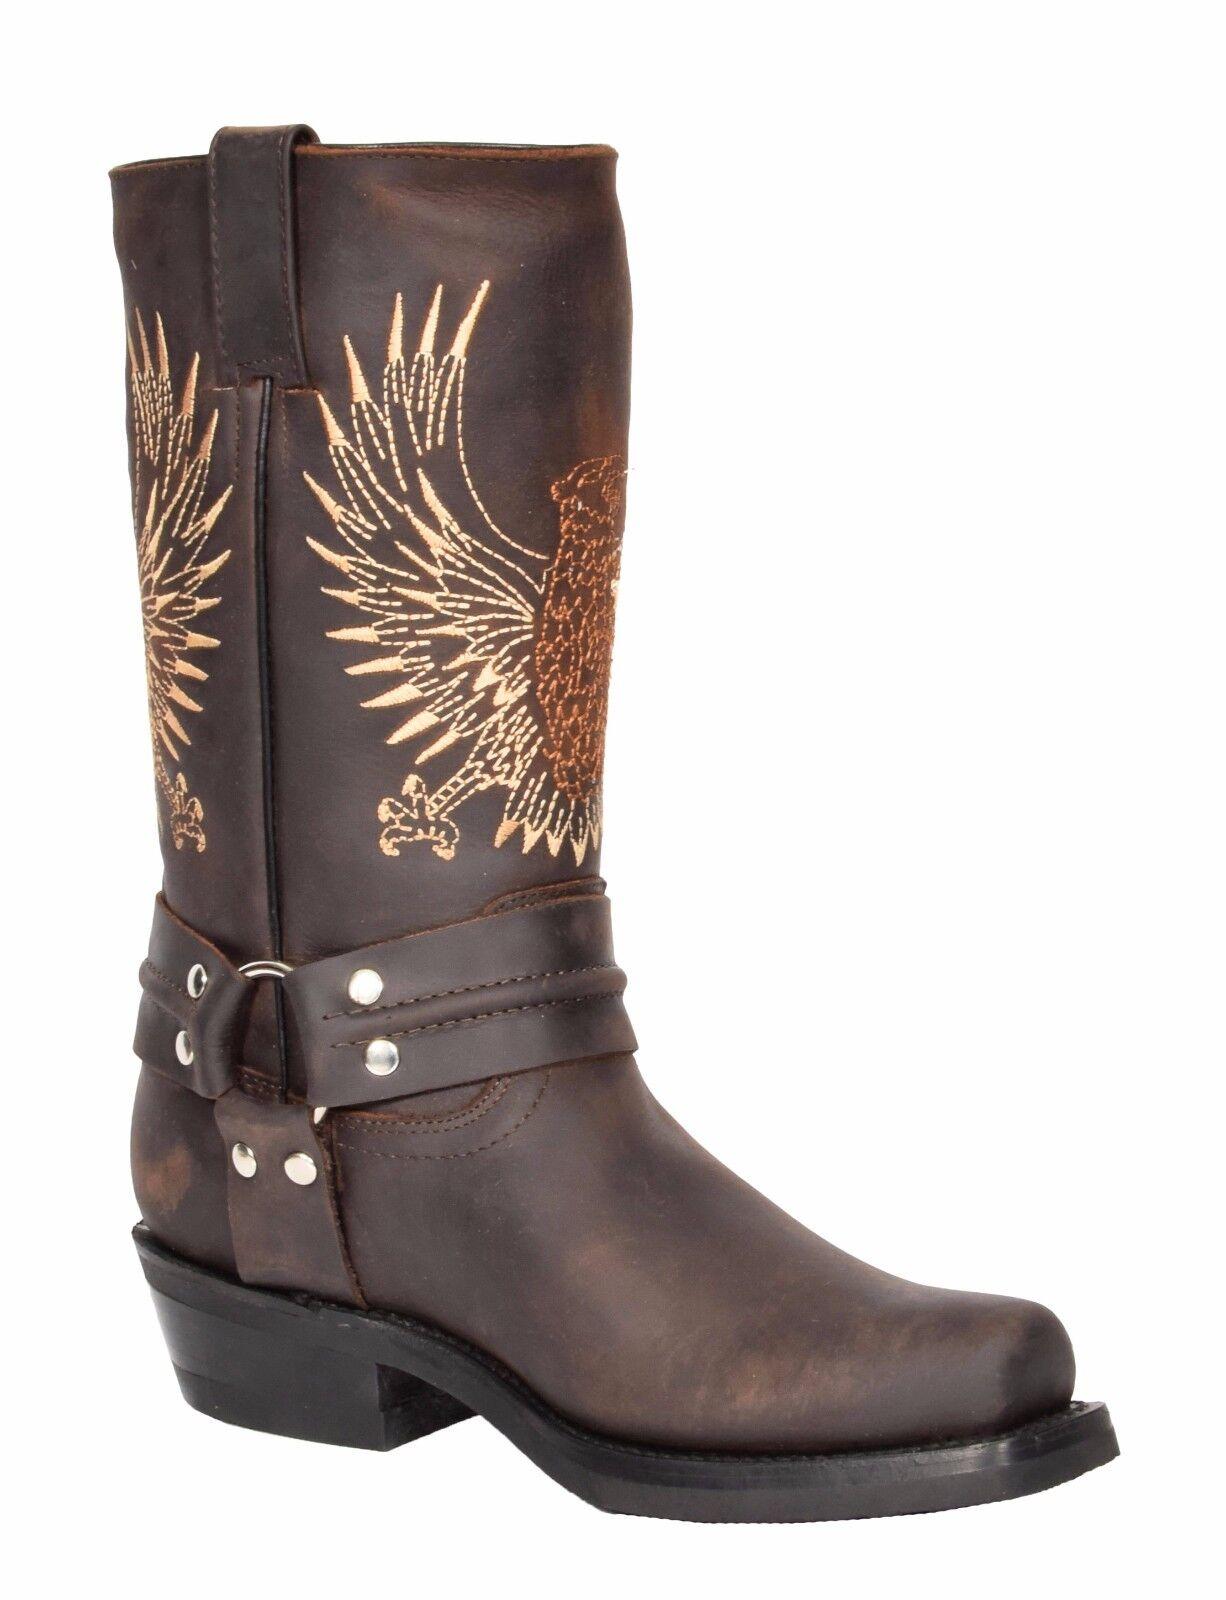 Mens braun Leather Cowboy Biker Stiefel Slip On Square Toe Designer Grinders Stiefel    | Angenehmes Gefühl